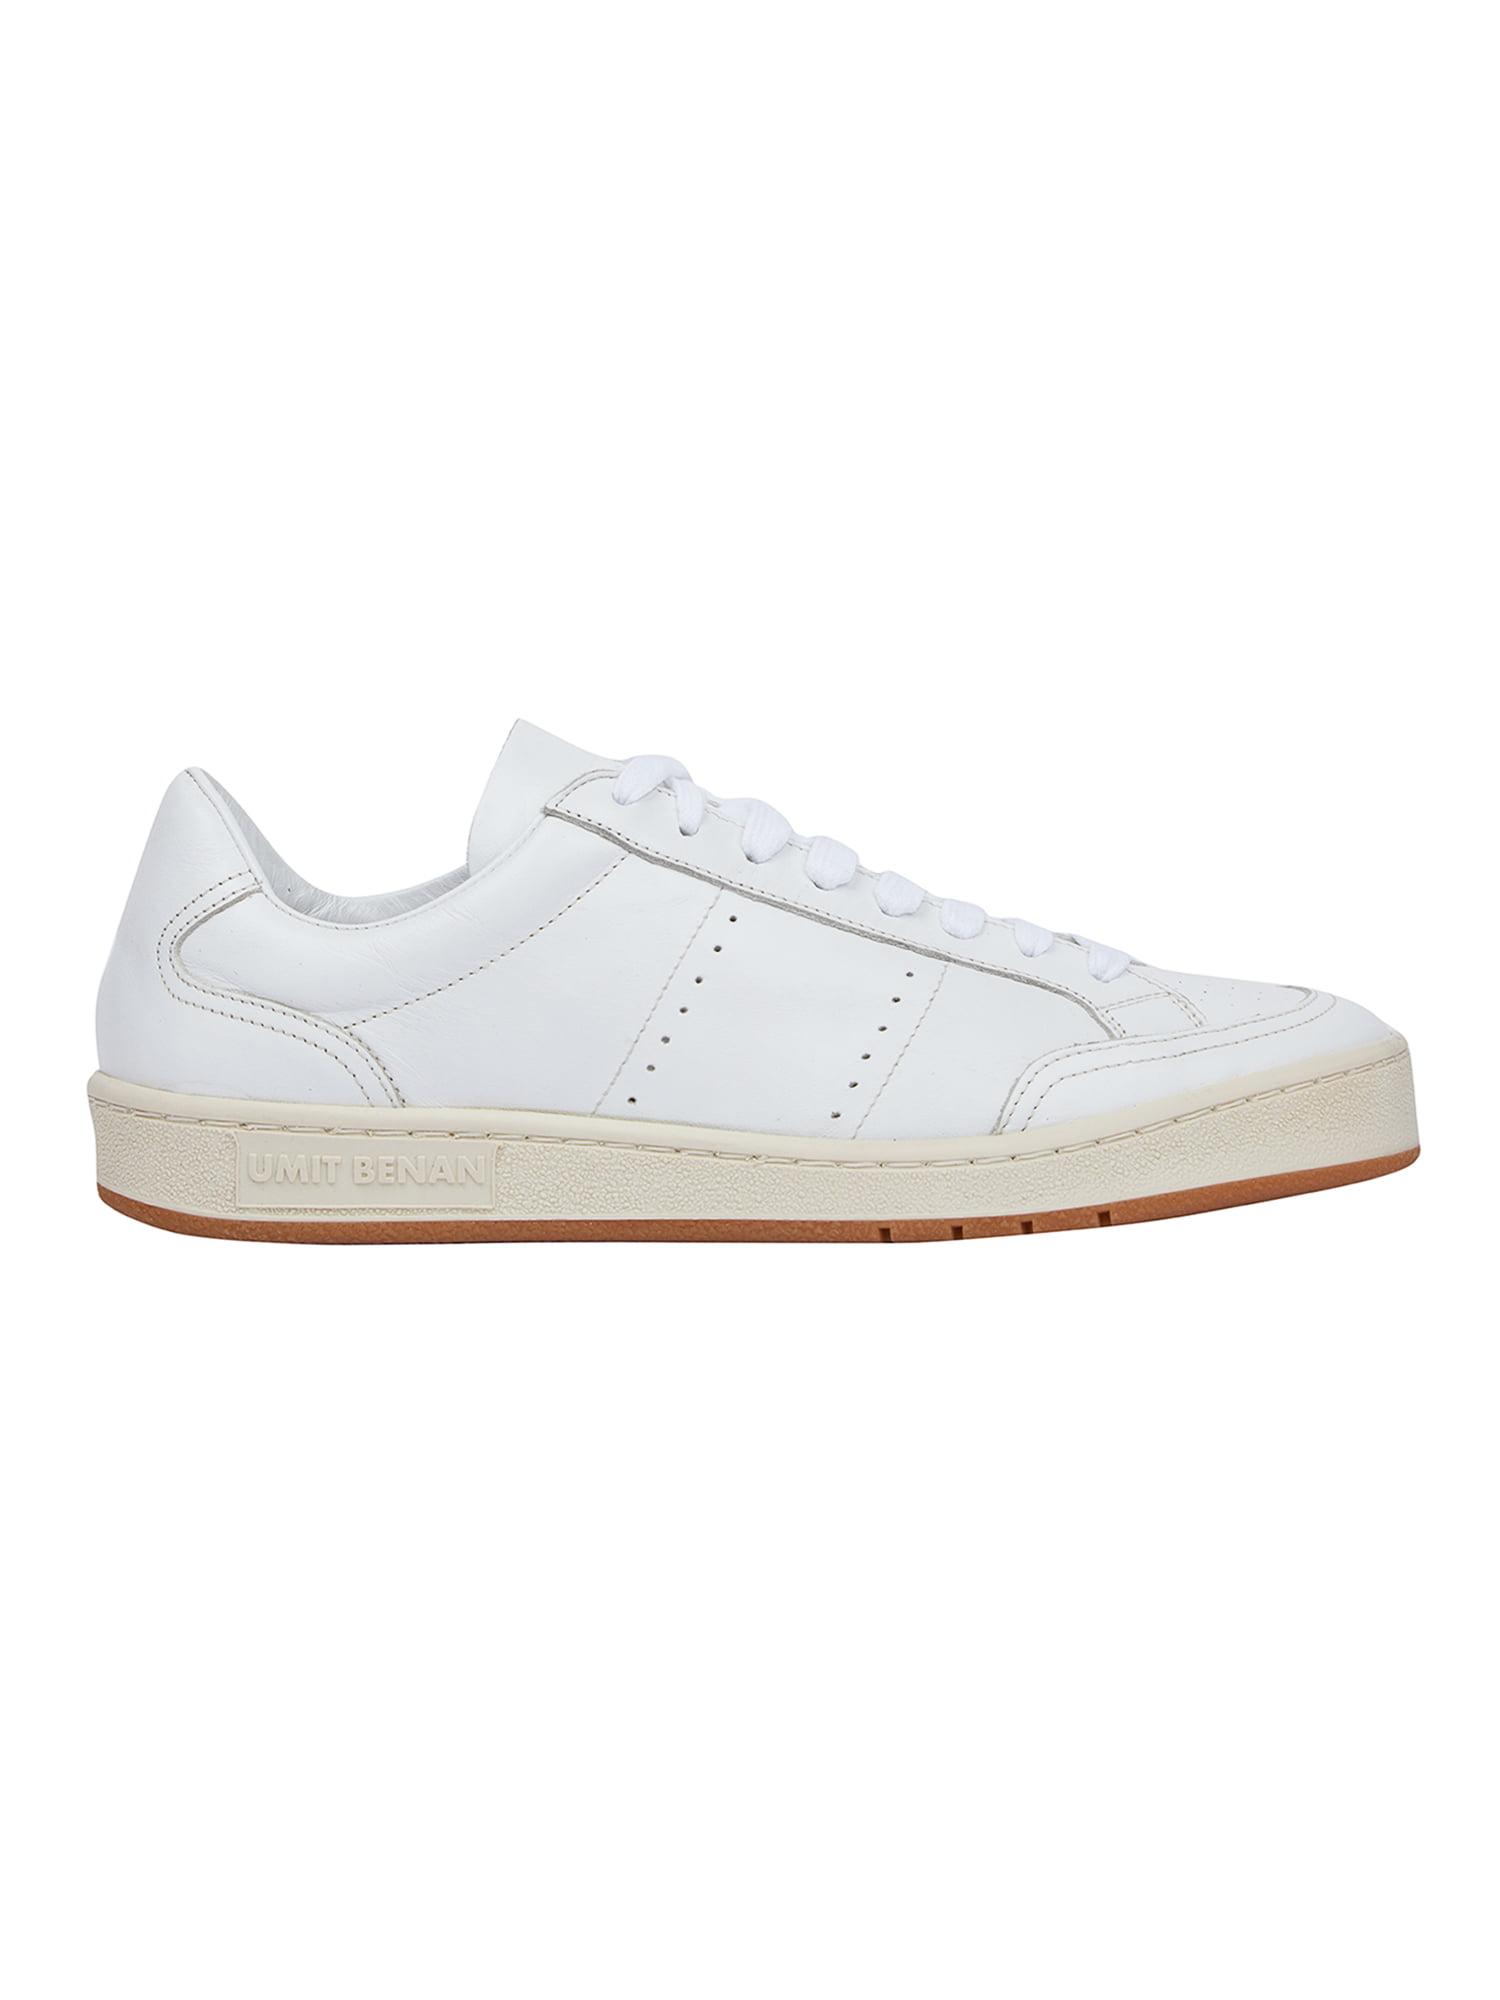 Umit Benan Men's Tennis Sneakers UB15 SNEAKERS All White